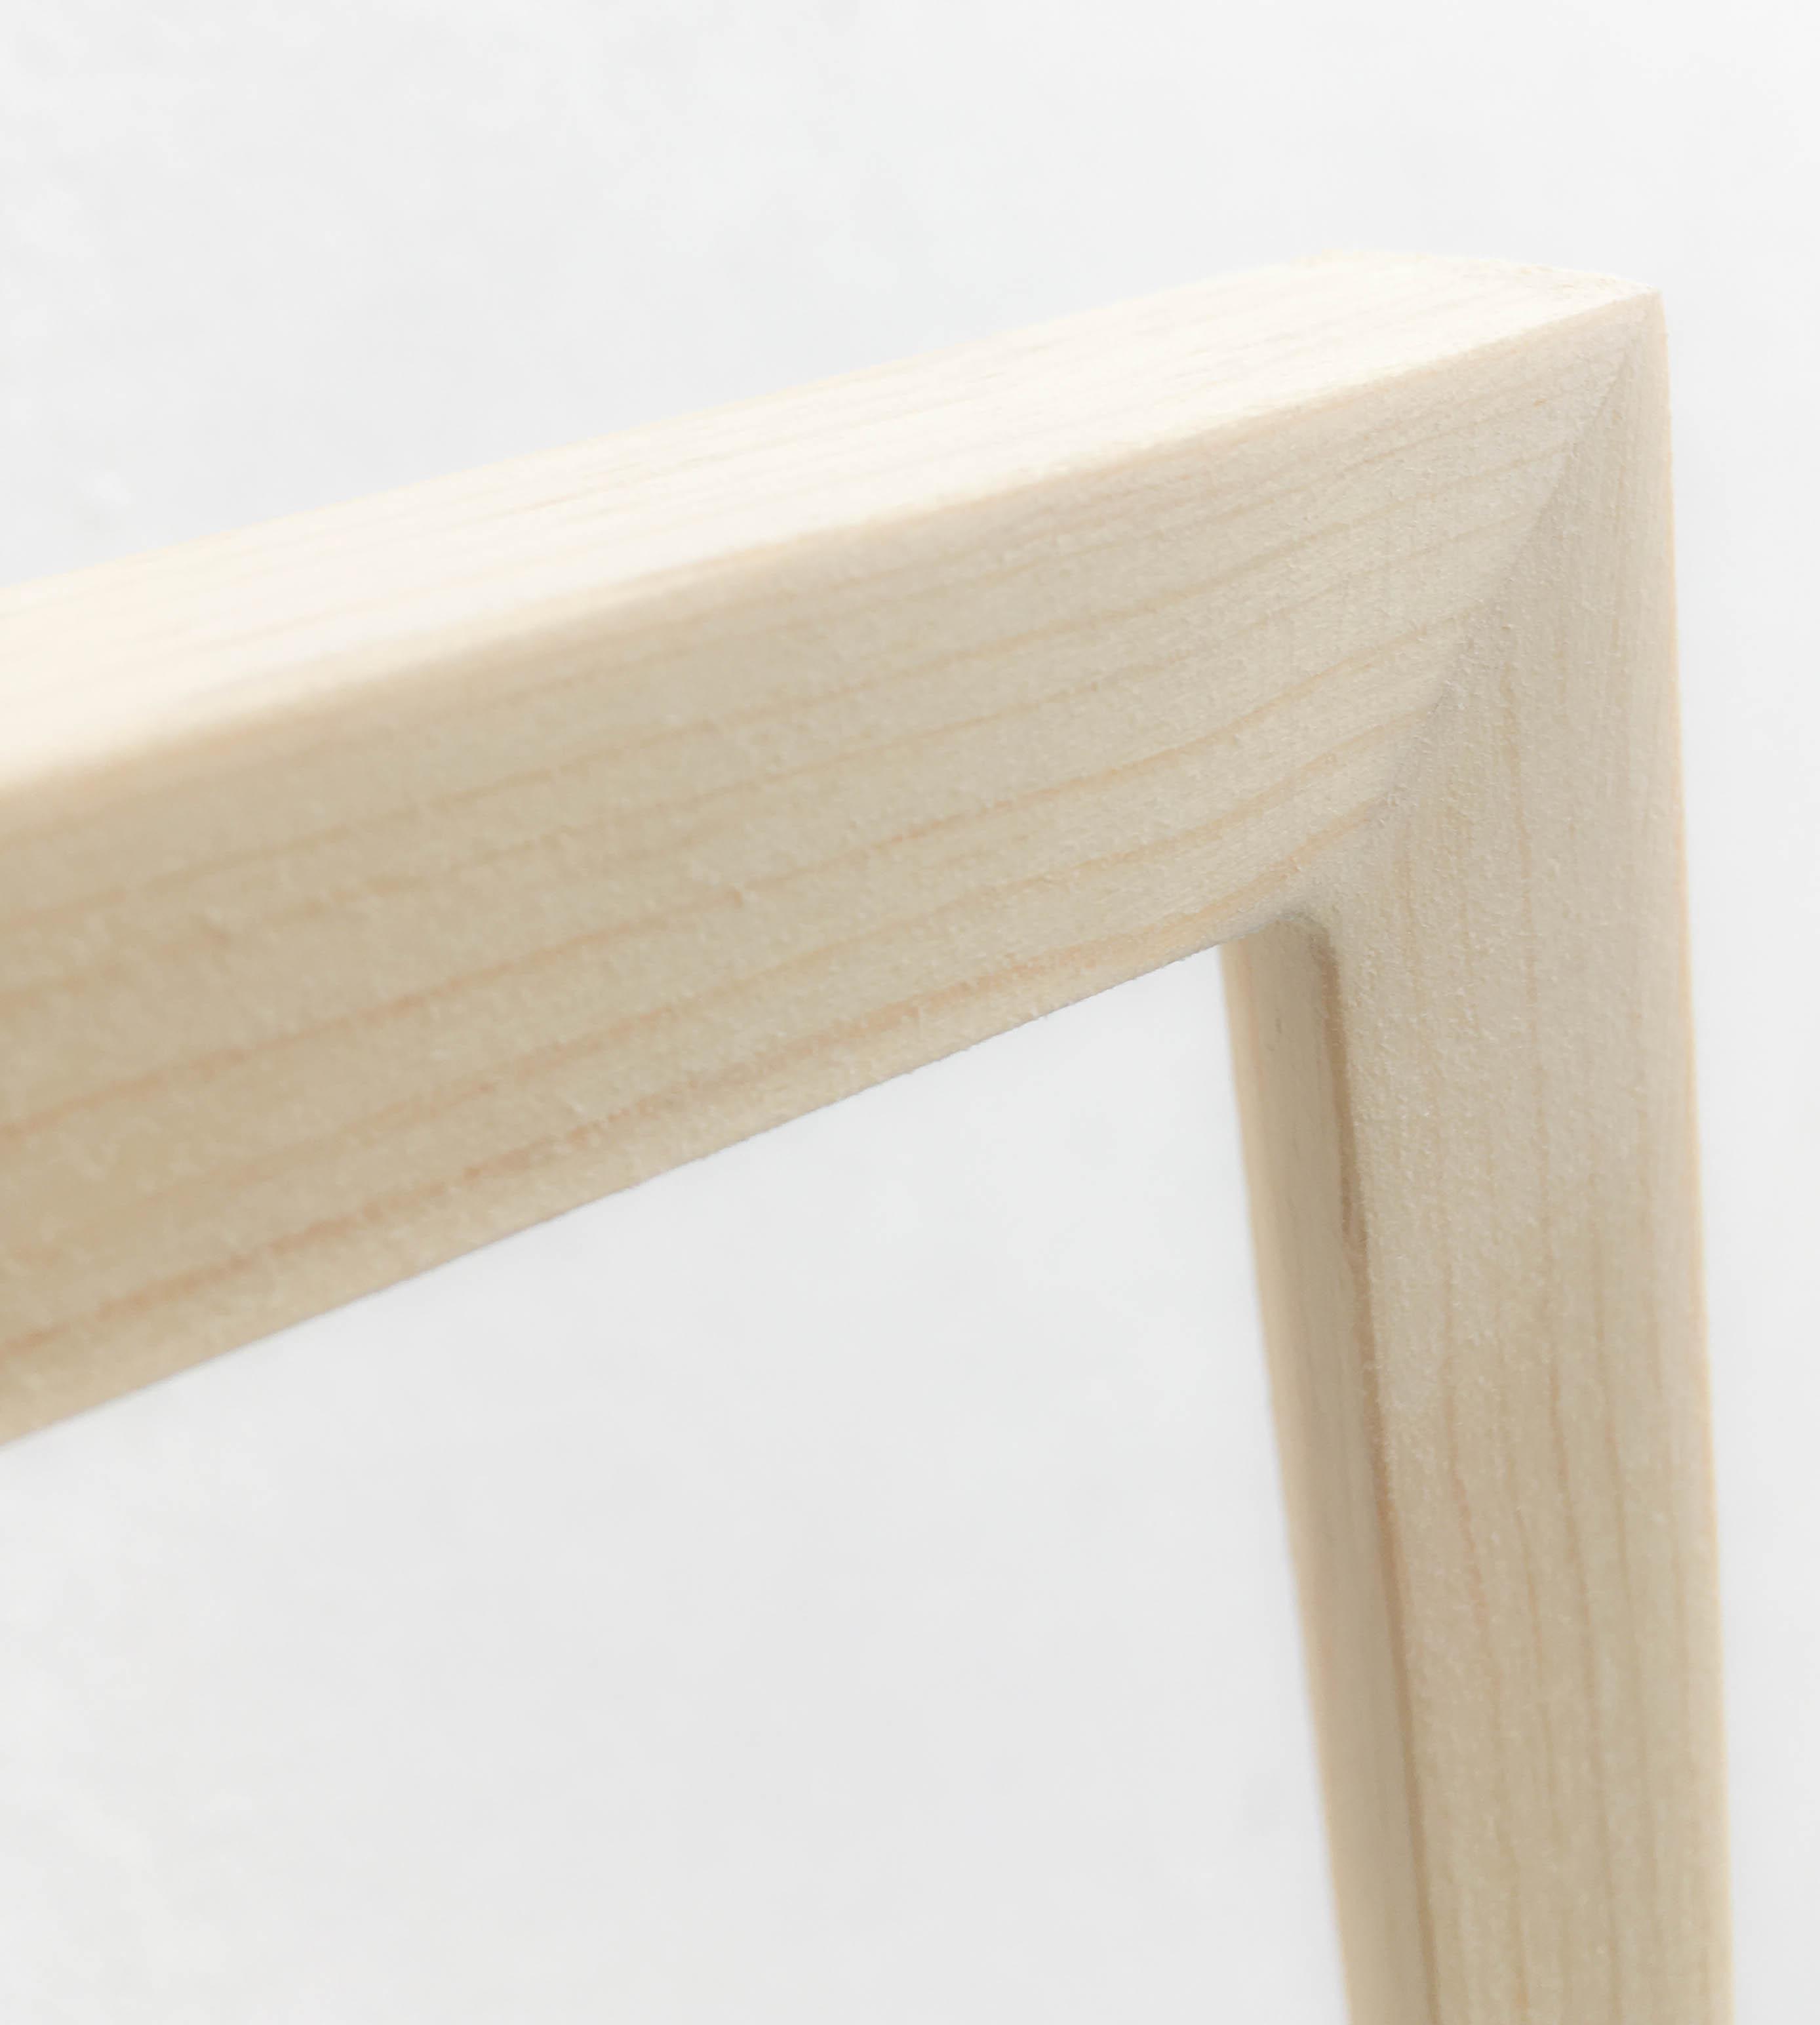 Mold Ml angosta madera